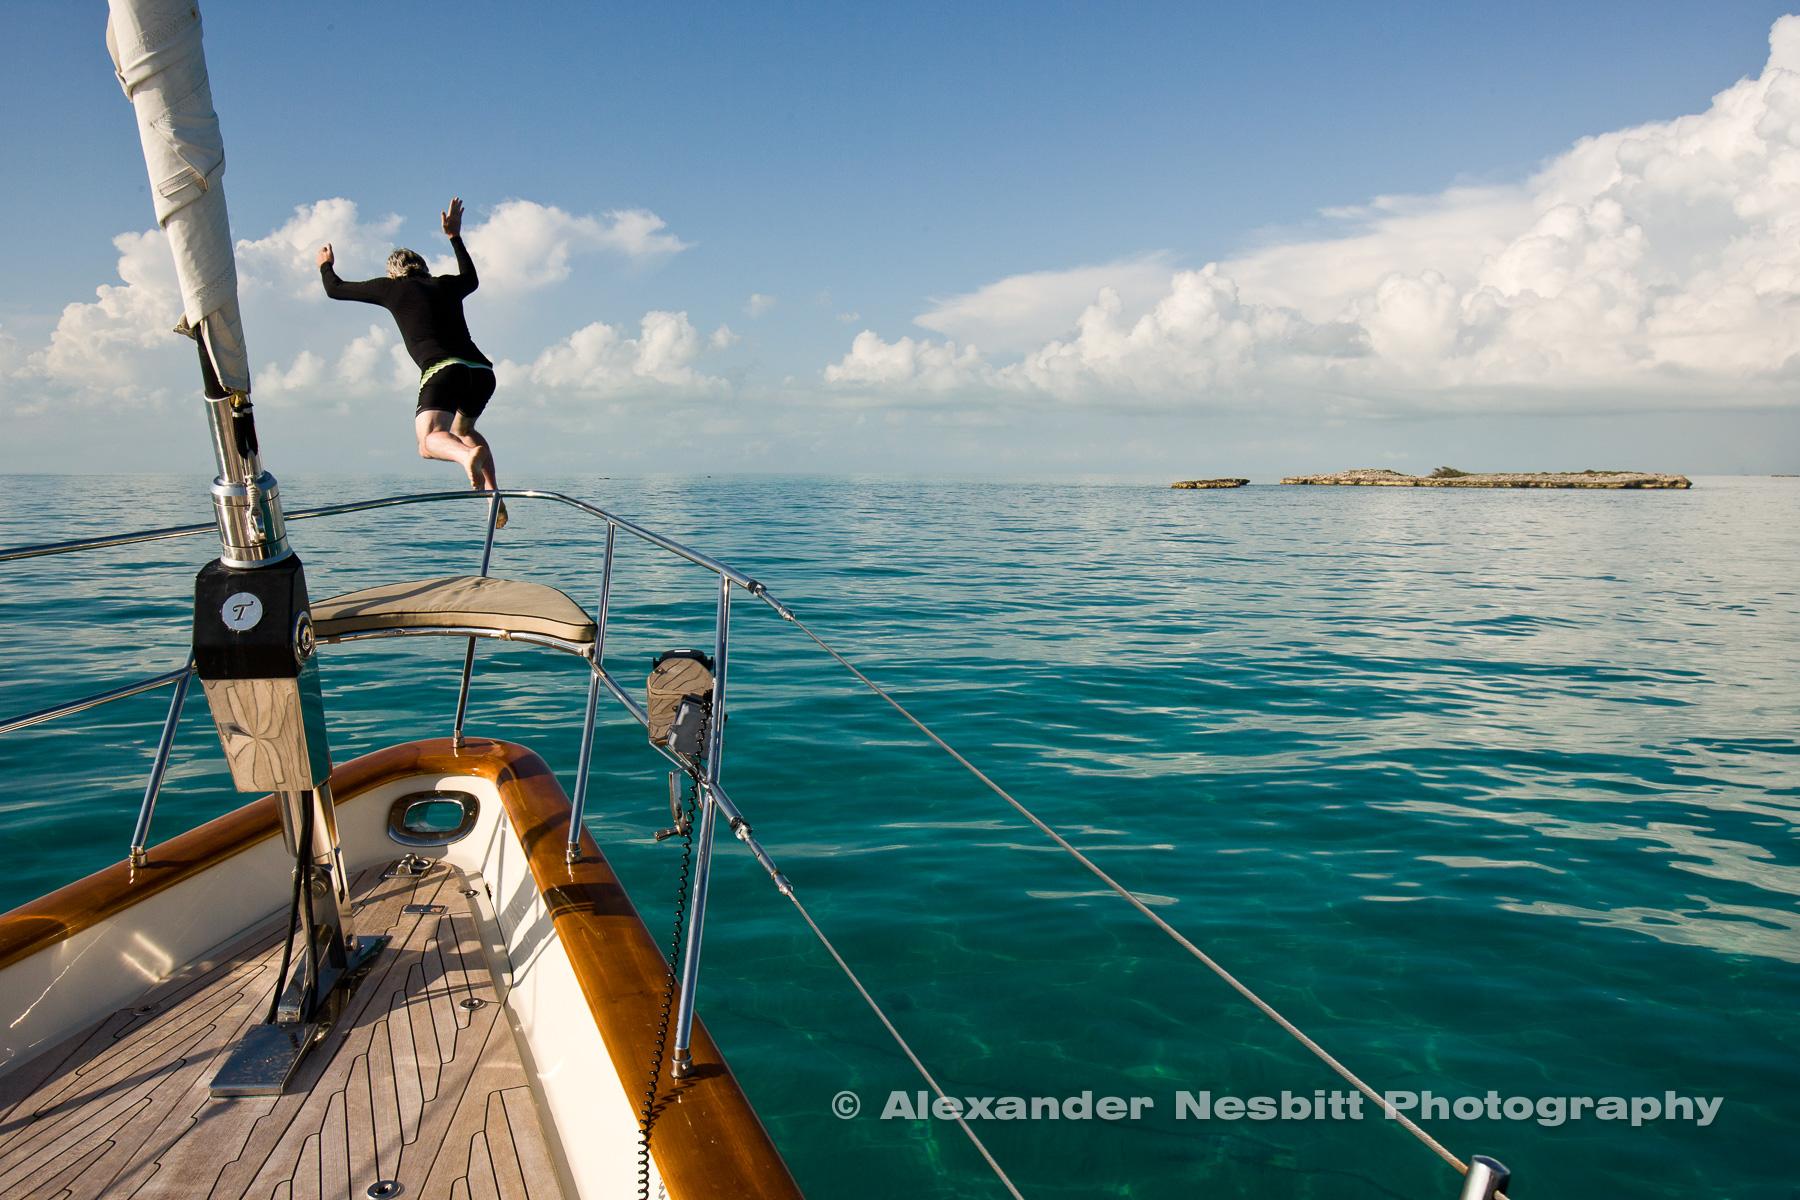 Nesbitt-Bahamas-09-selects-VX3U6789